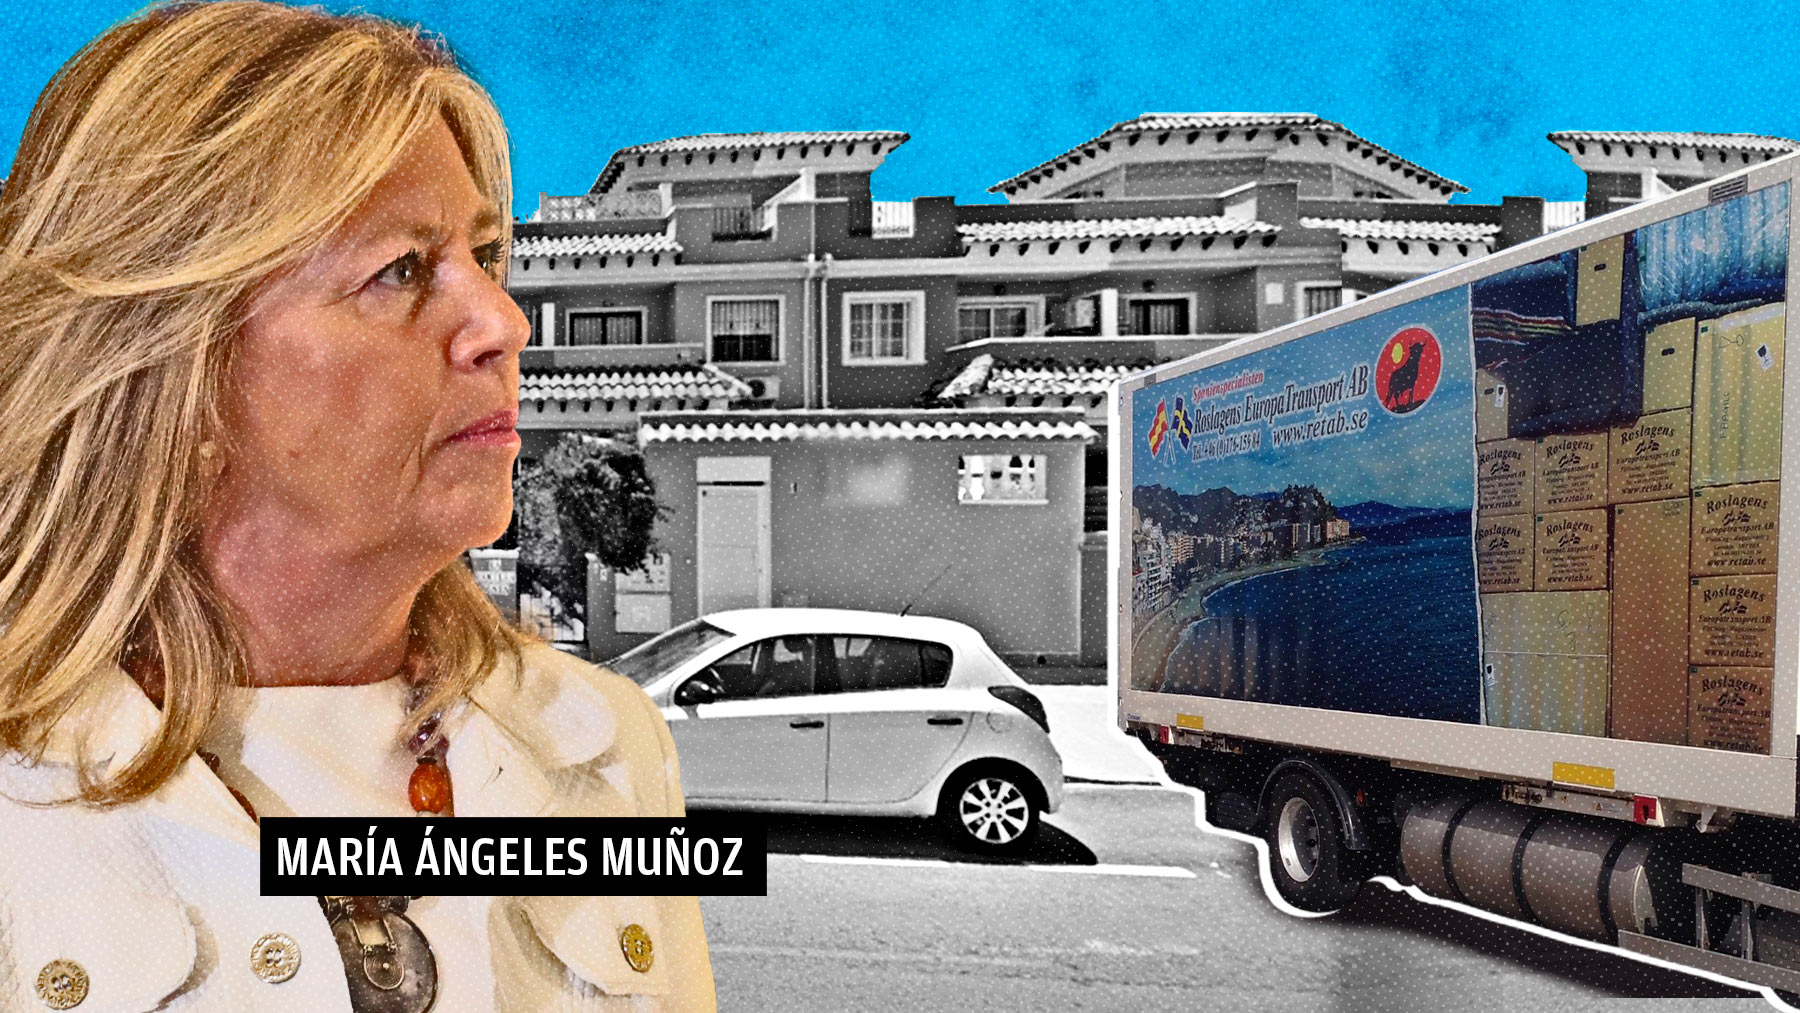 Fotomontaje de la alcaldesa de Marbella, Ángeles Muñoz.